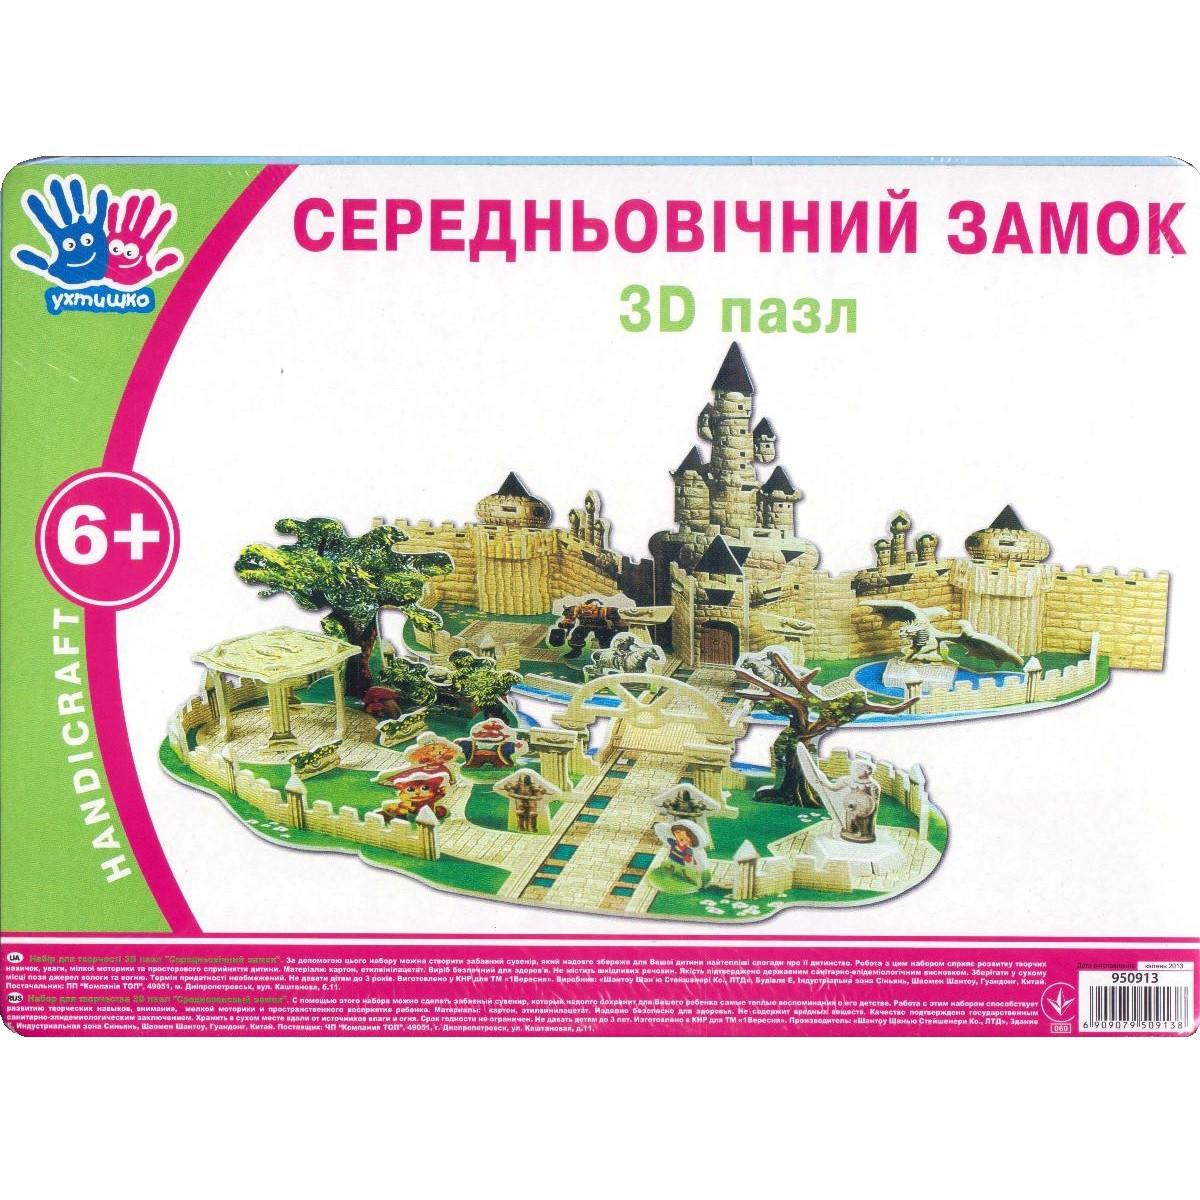 "Пазлы 3Д ""Средневековый замок"" 950913"